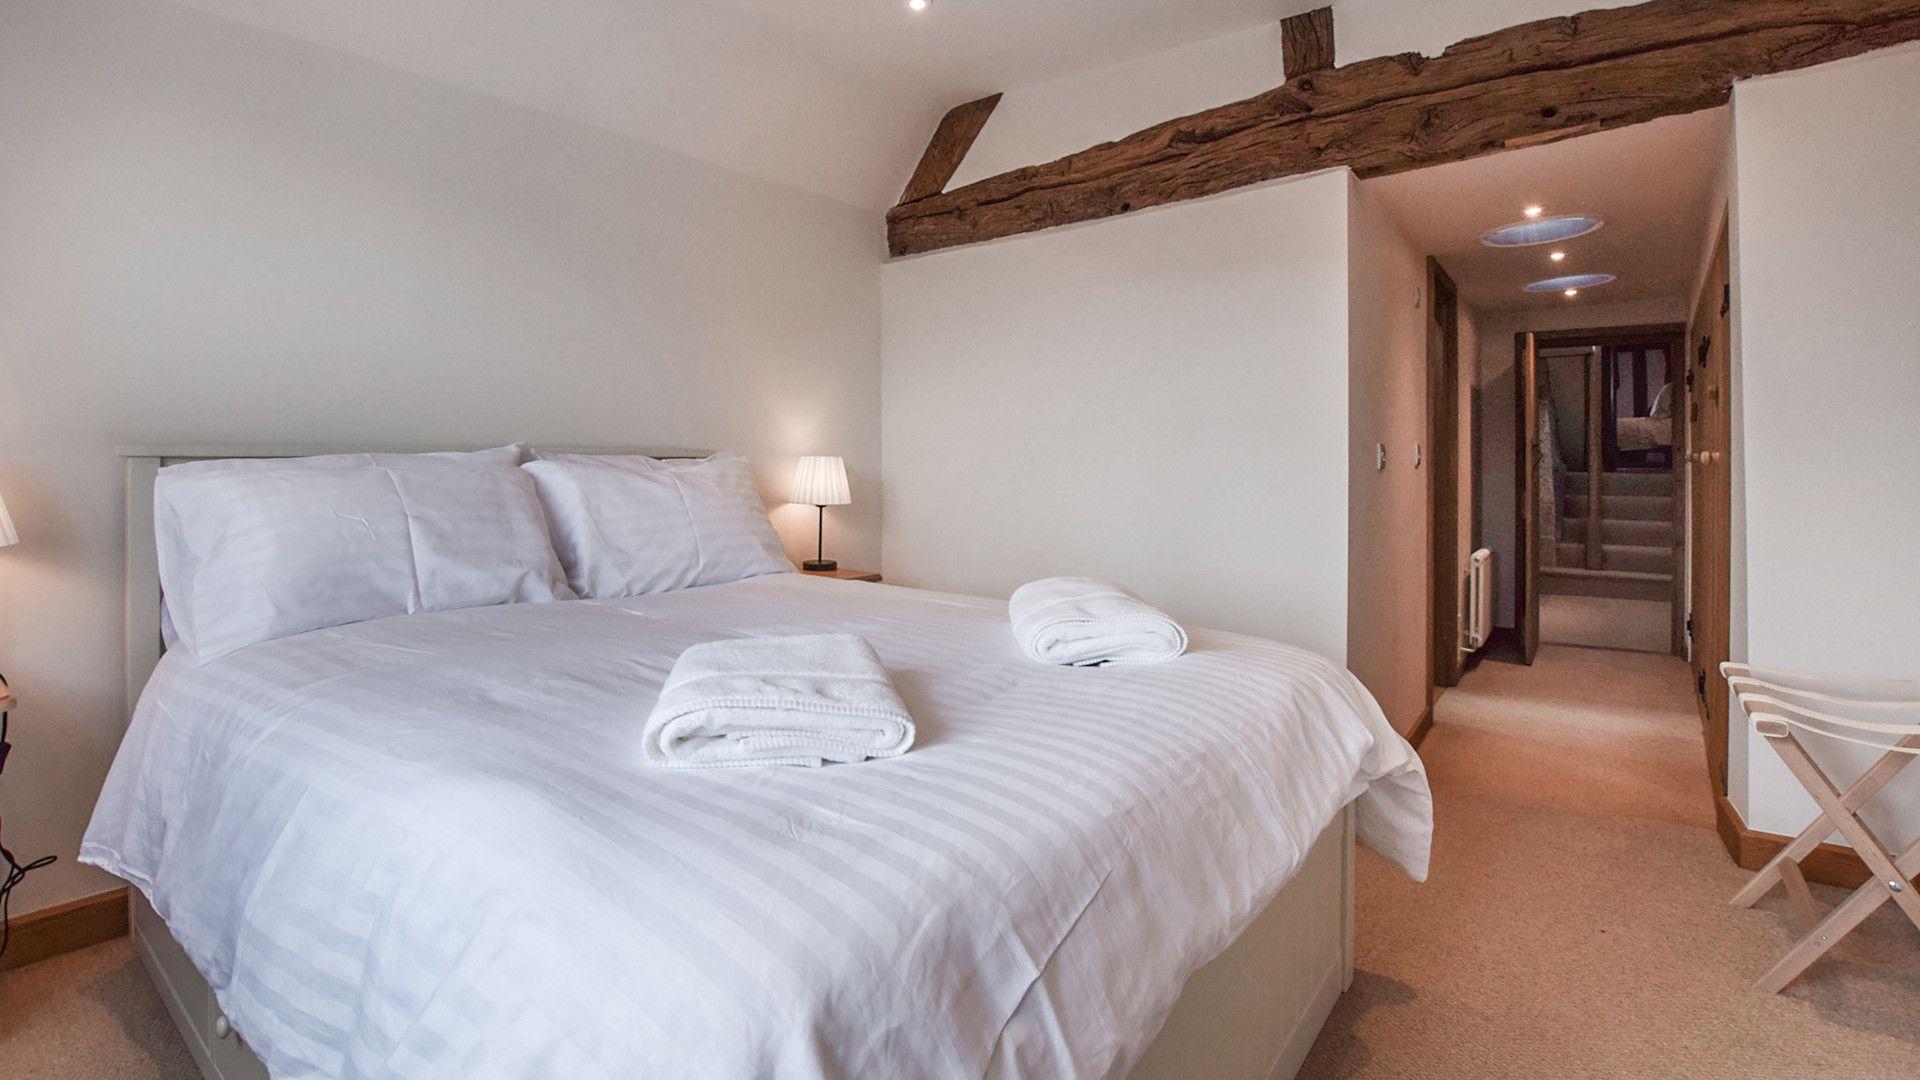 Bedroom 2, king-size, Mercia House, Bolthole Retreats